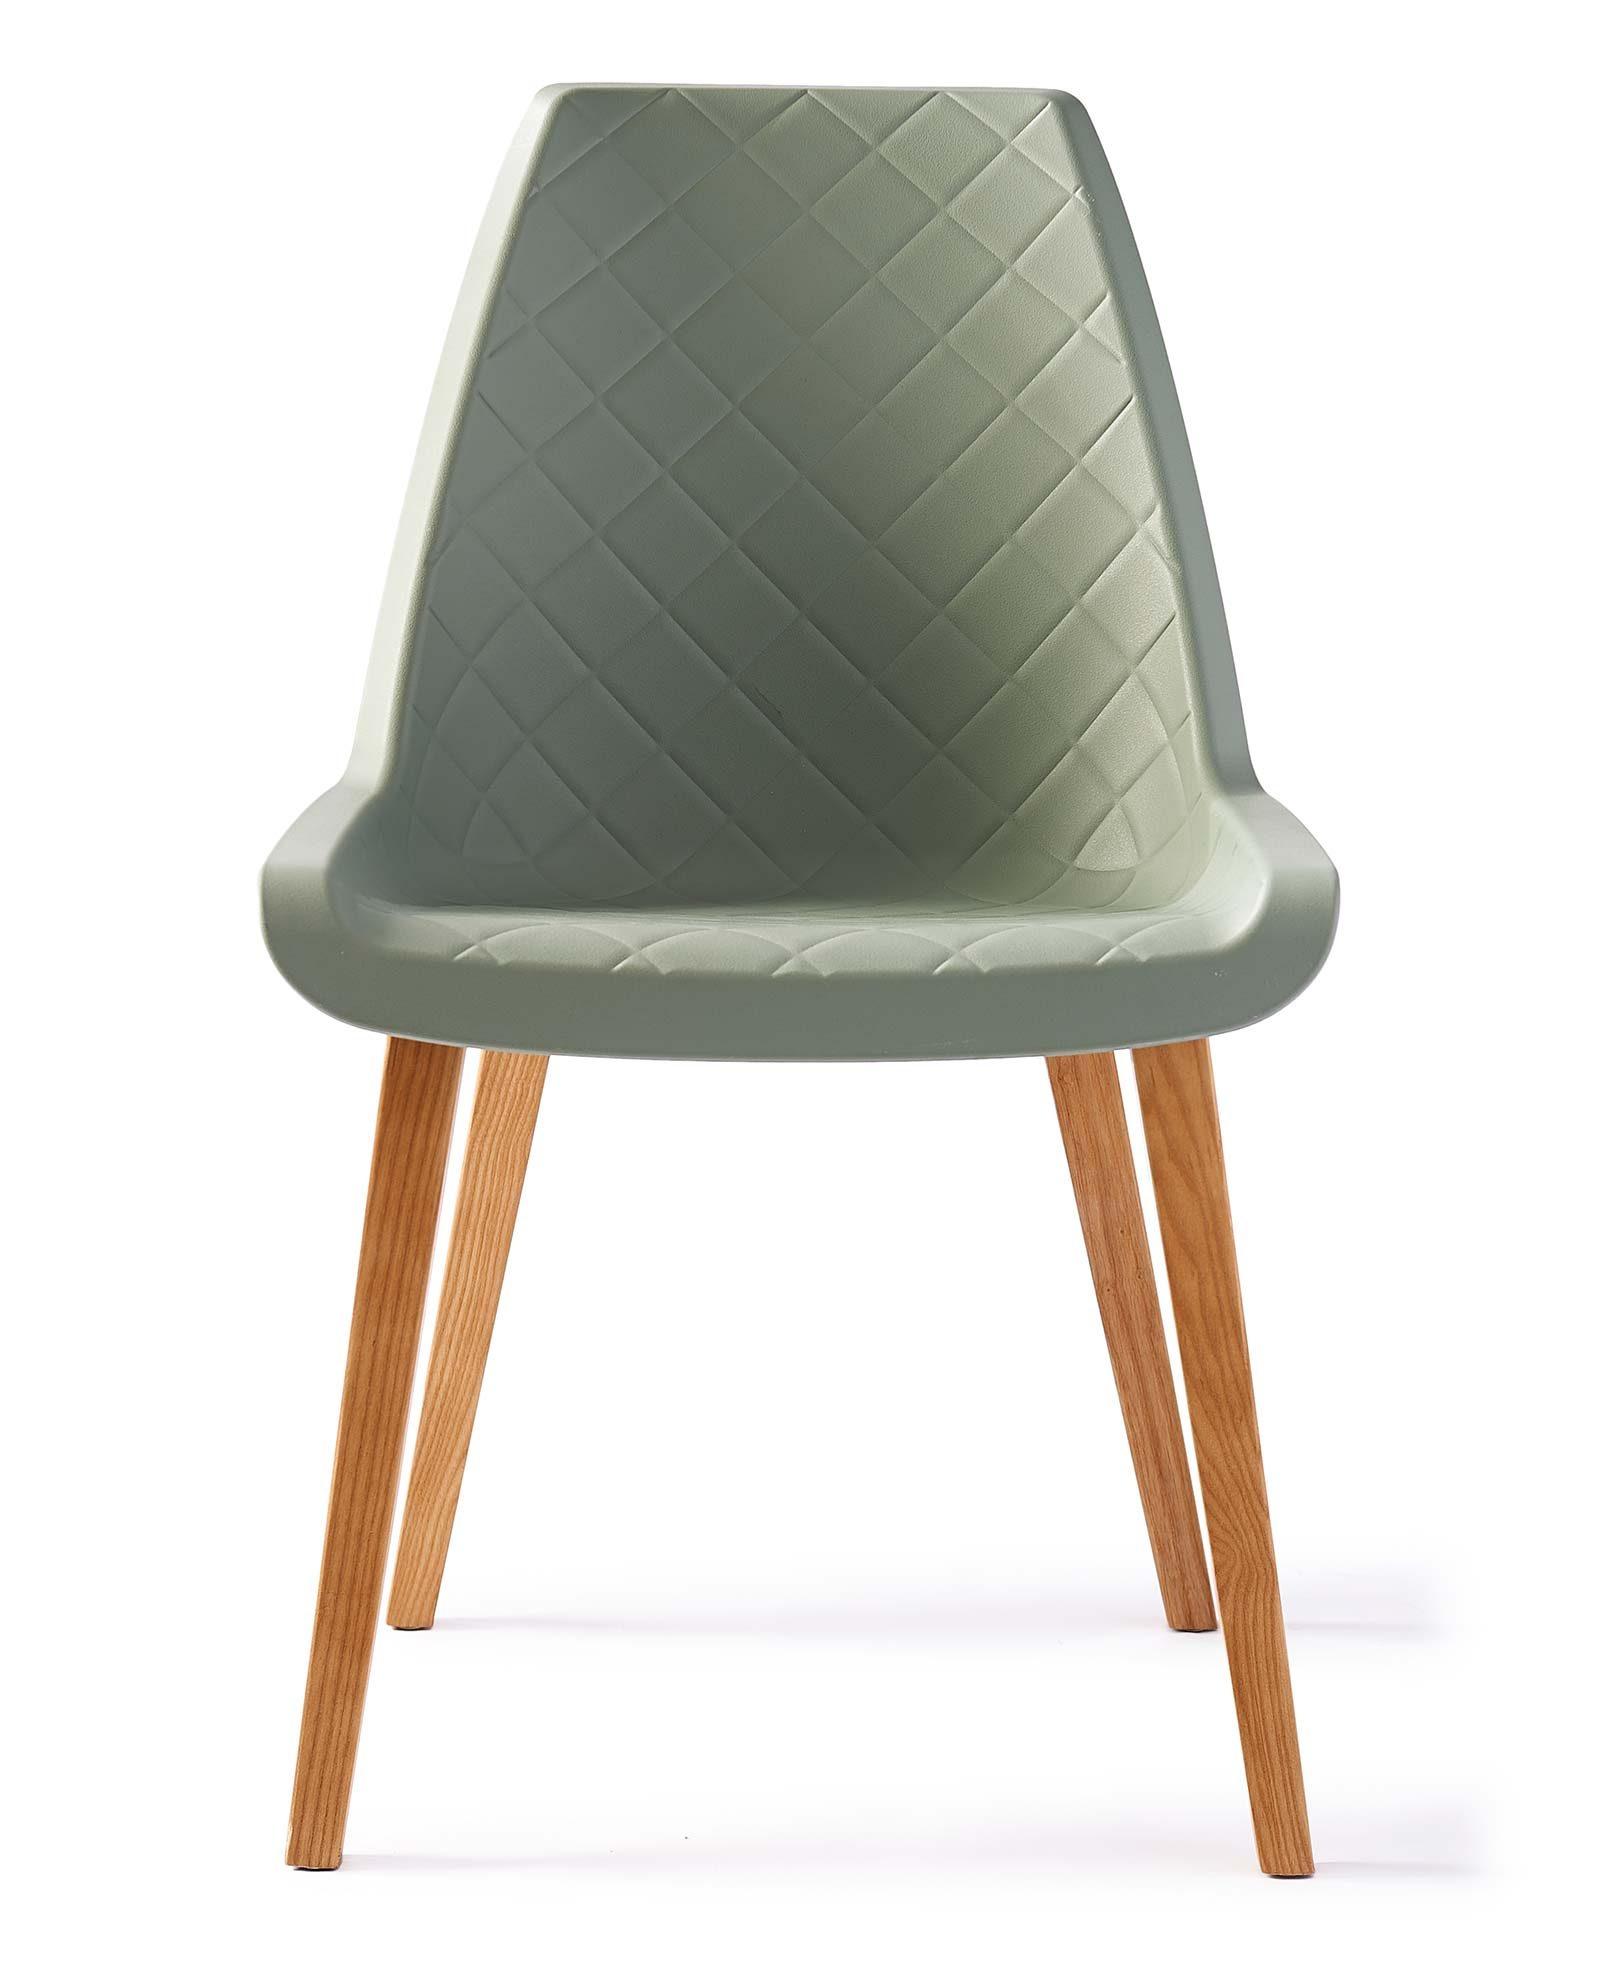 Riviera Maison dining chair Amsterdam City Green 4321003 2